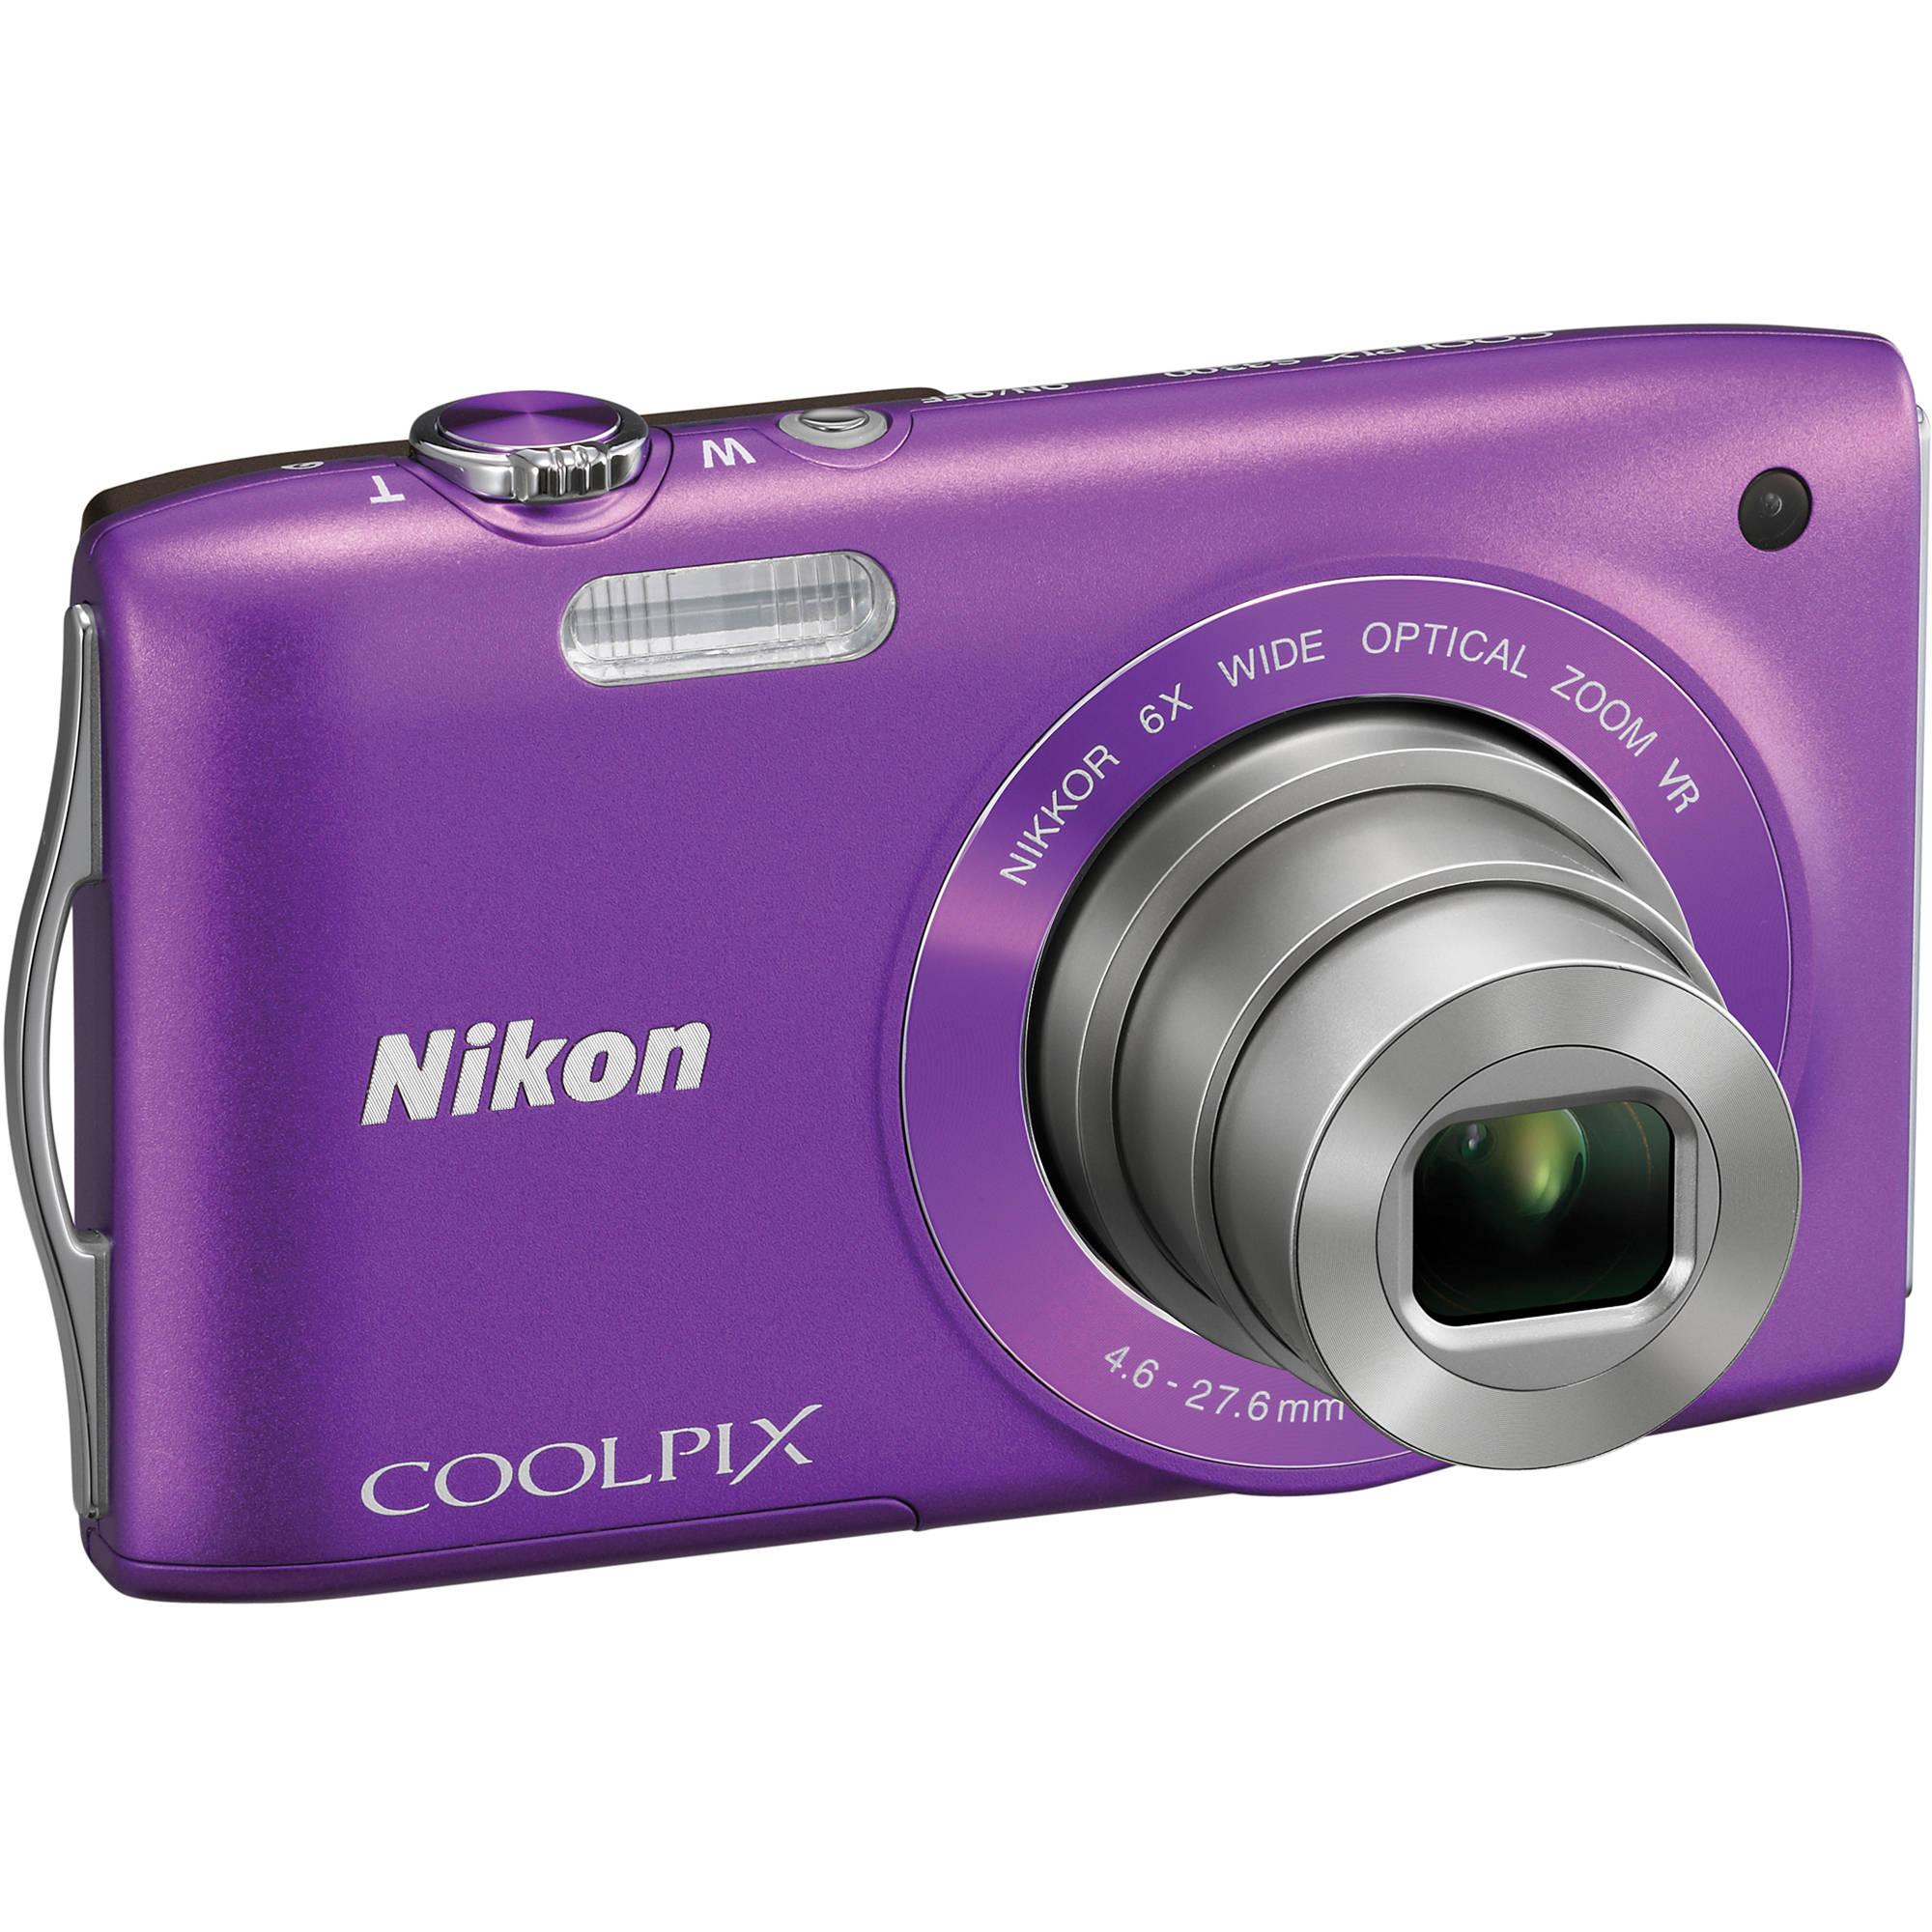 nikon coolpix s3300 digital camera purple 26312 b h photo rh bhphotovideo com Nikon Coolpix User Manual nikon coolpix s33 reference manual